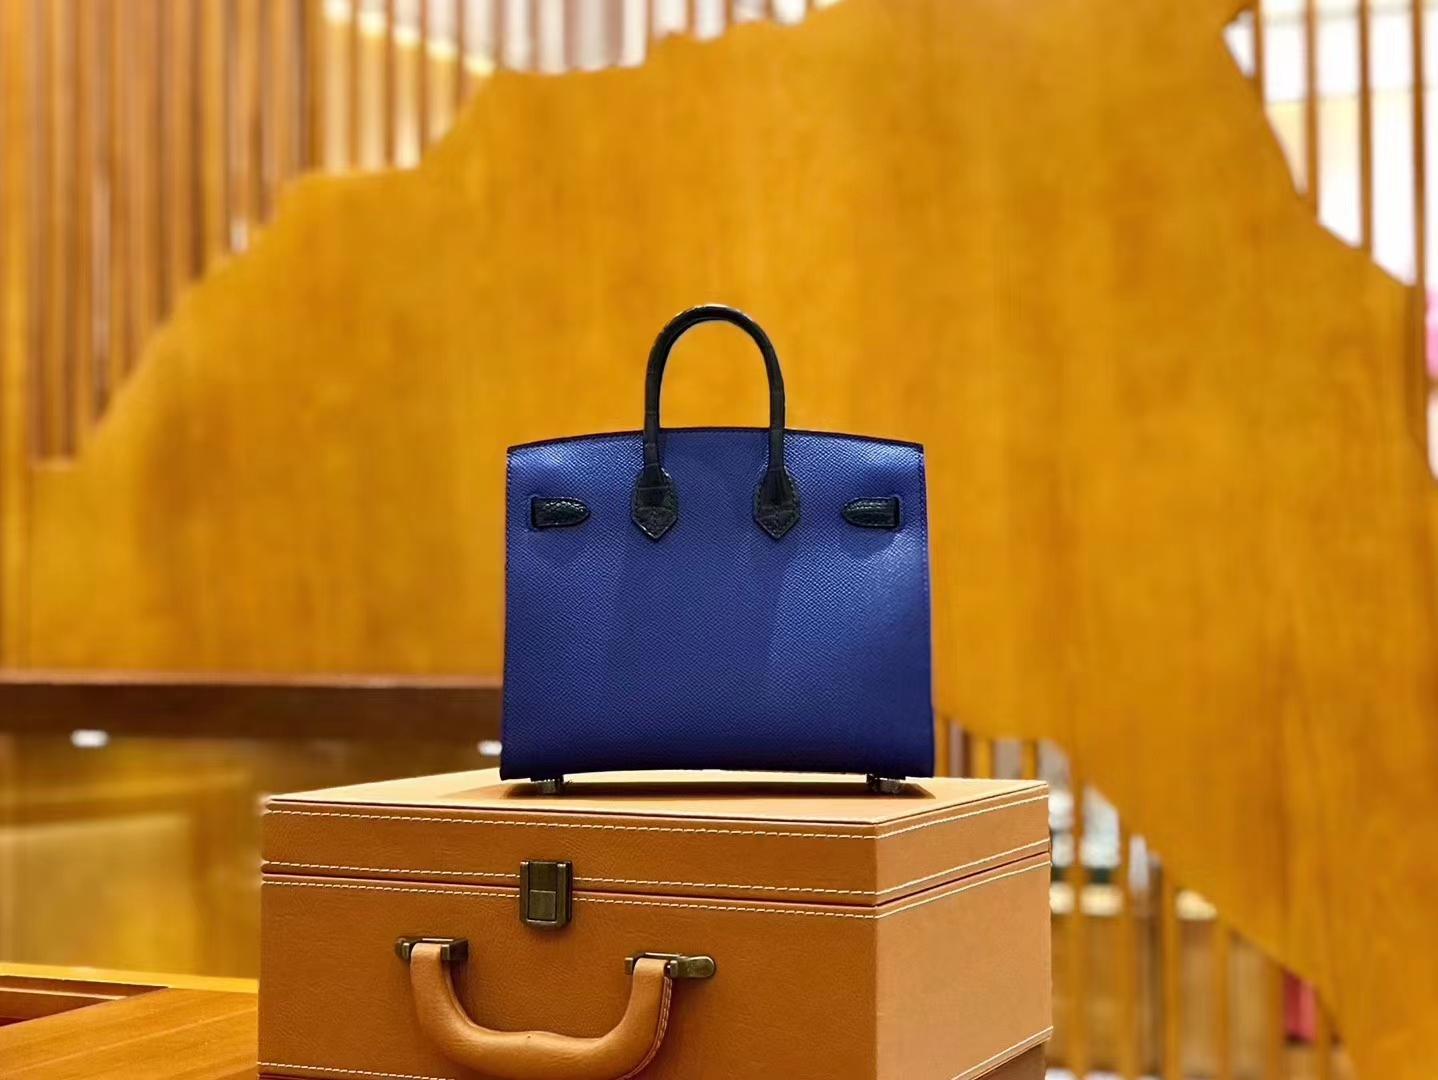 Hermès(爱马仕)Birkin 20cm 限量版小房子 宝蓝色 Epsom拼鳄鱼皮 顶级全手缝工序